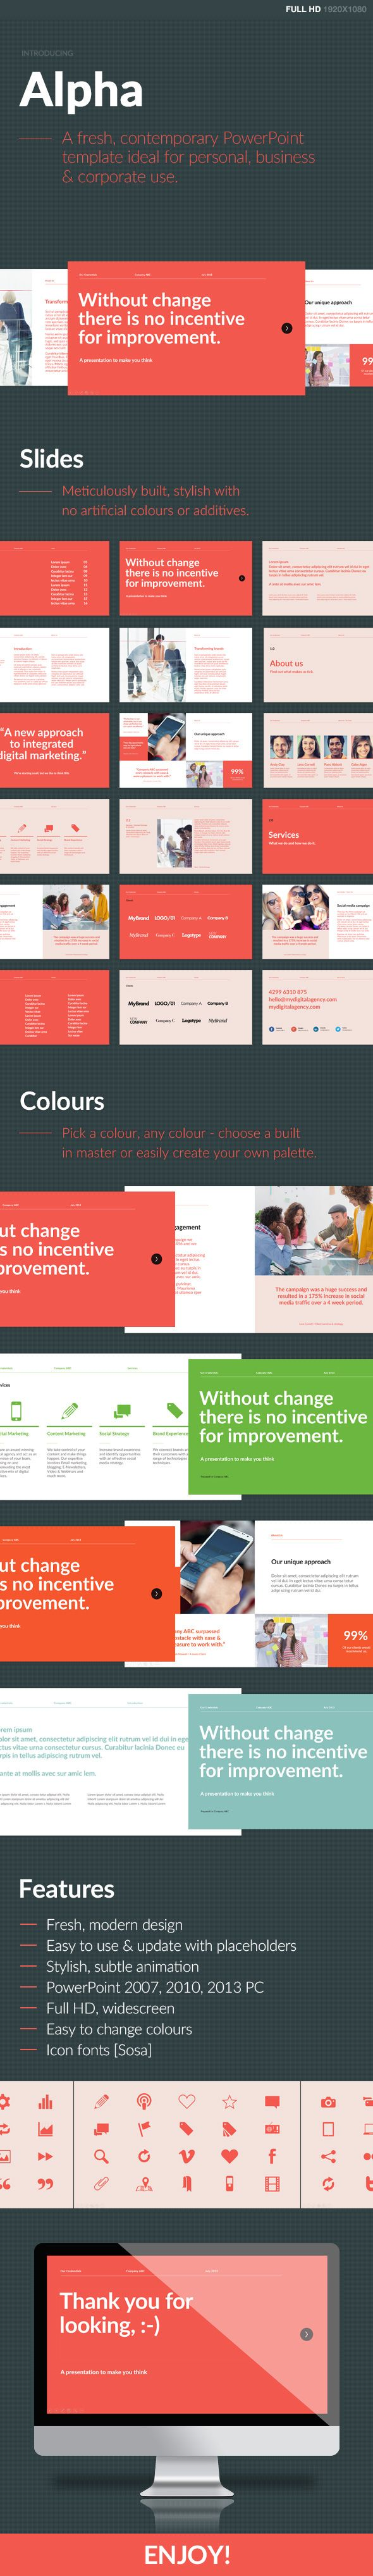 https://www.behance.net/gallery/24618005/Alpha-PowerPoint-Template